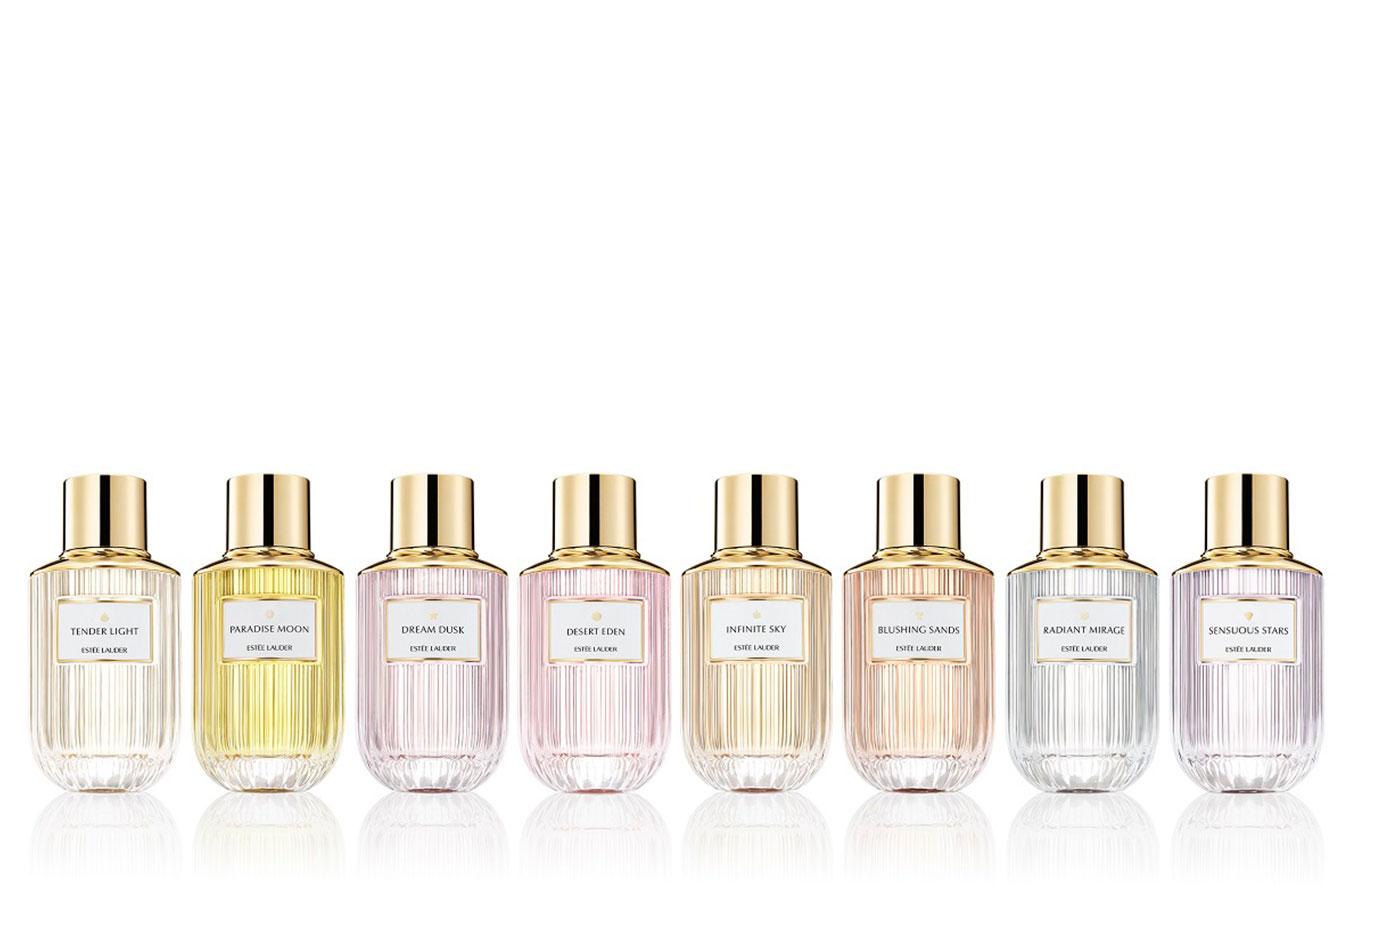 Estee Lauder launches a luxury fragrance range